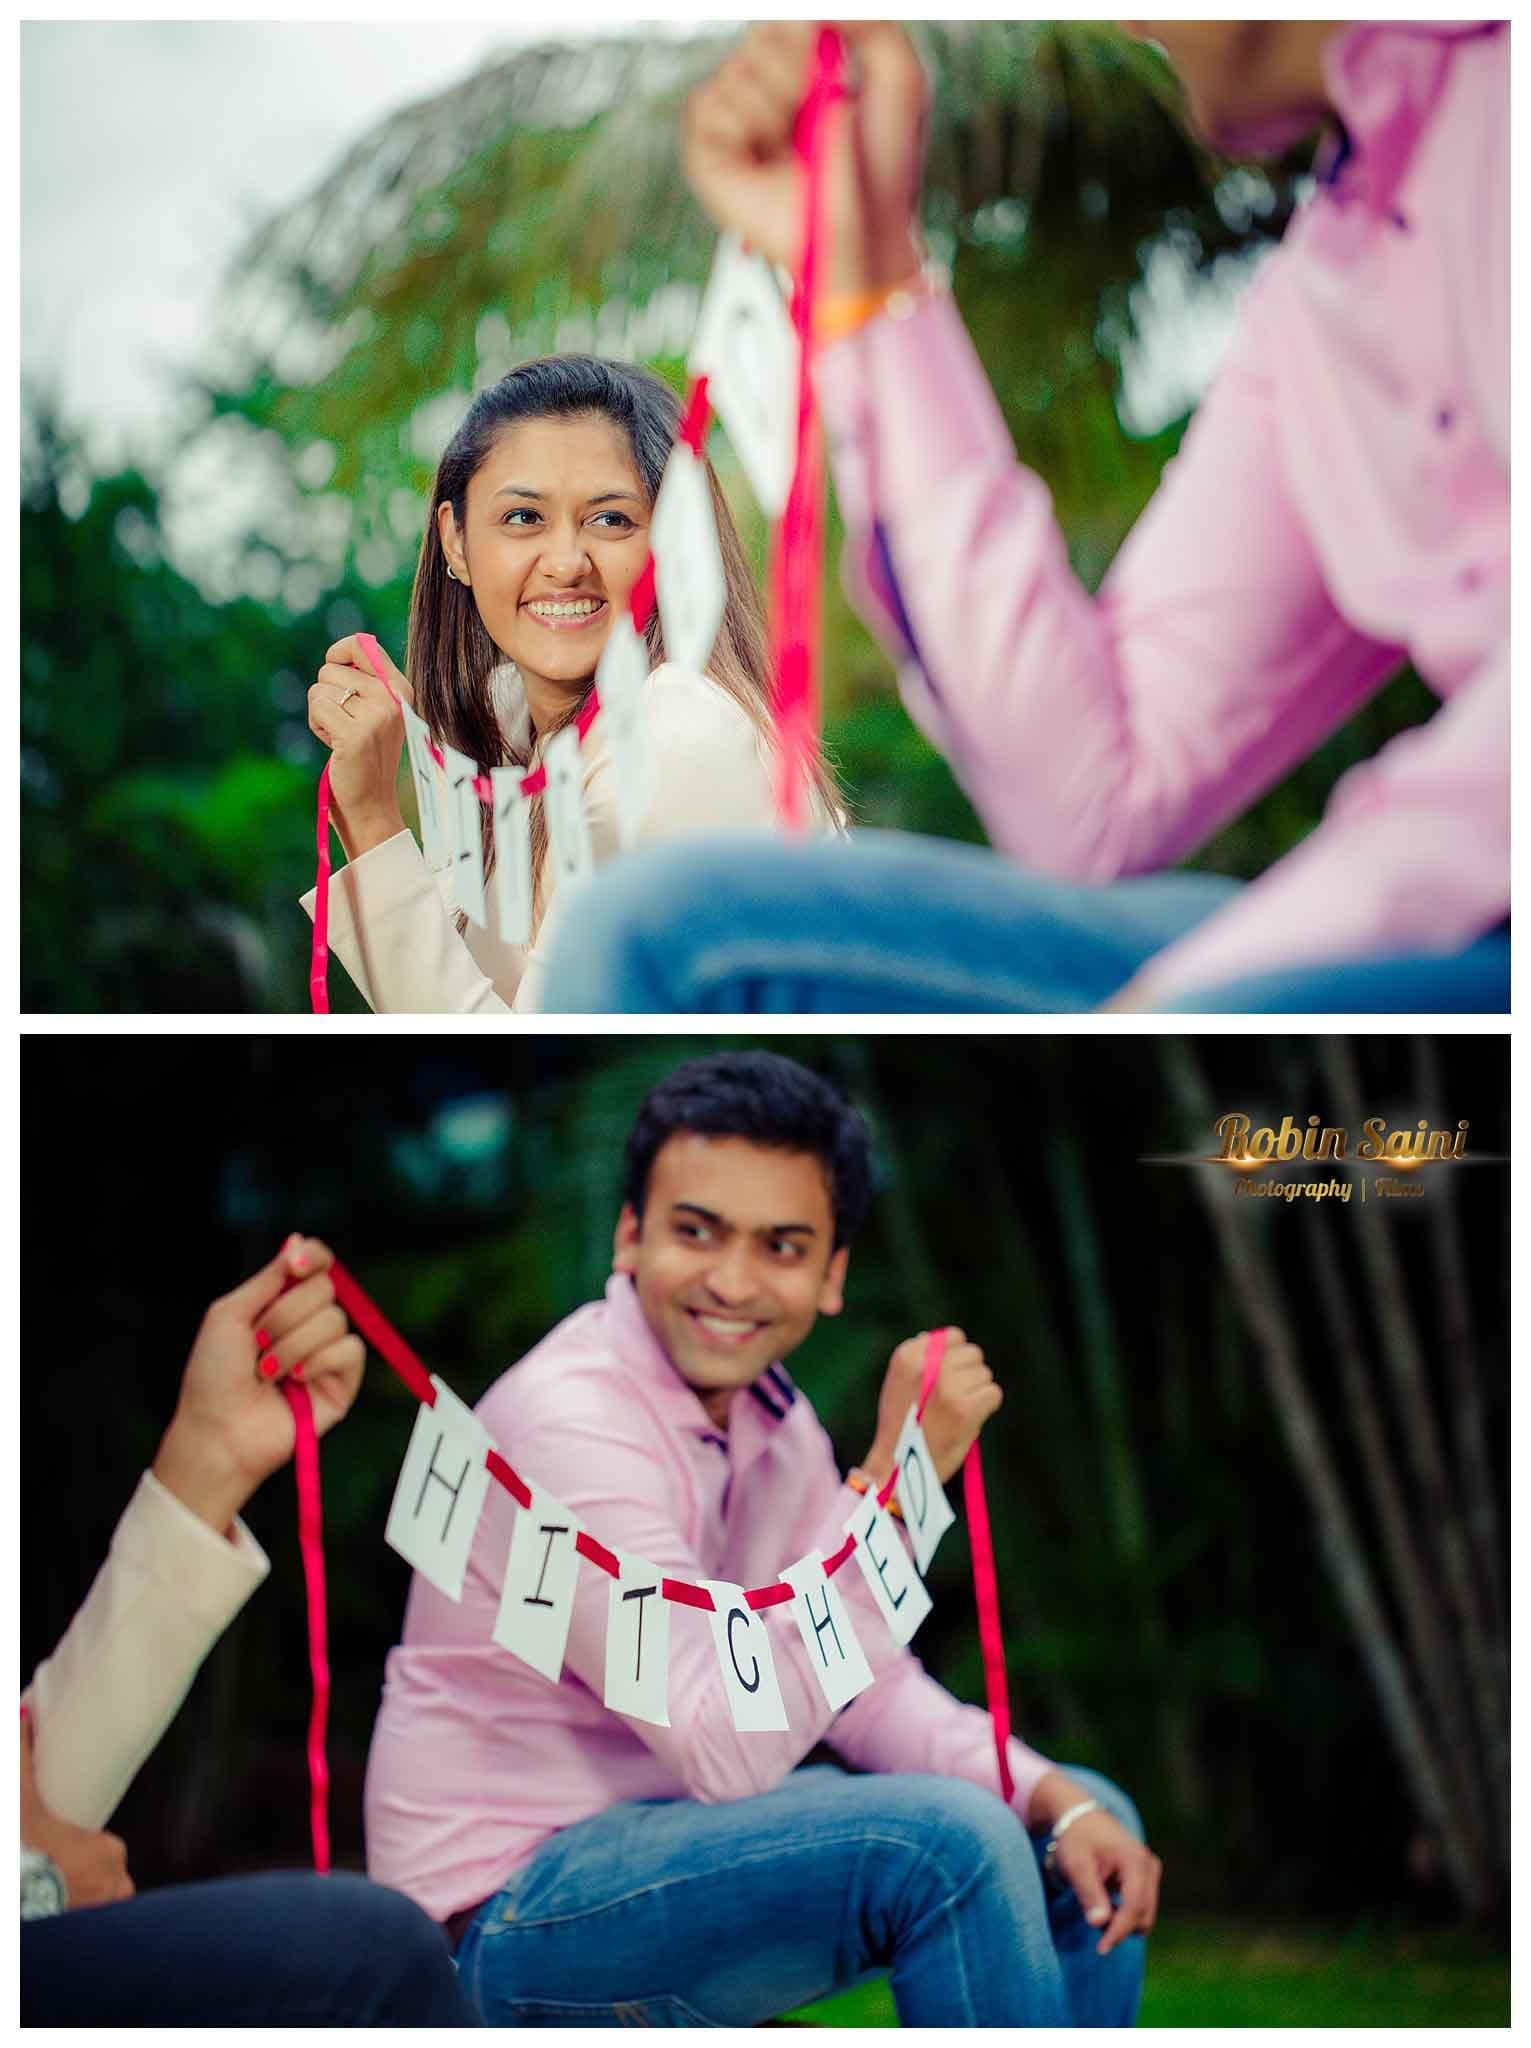 pre wedding candid clicks:robin saini photography